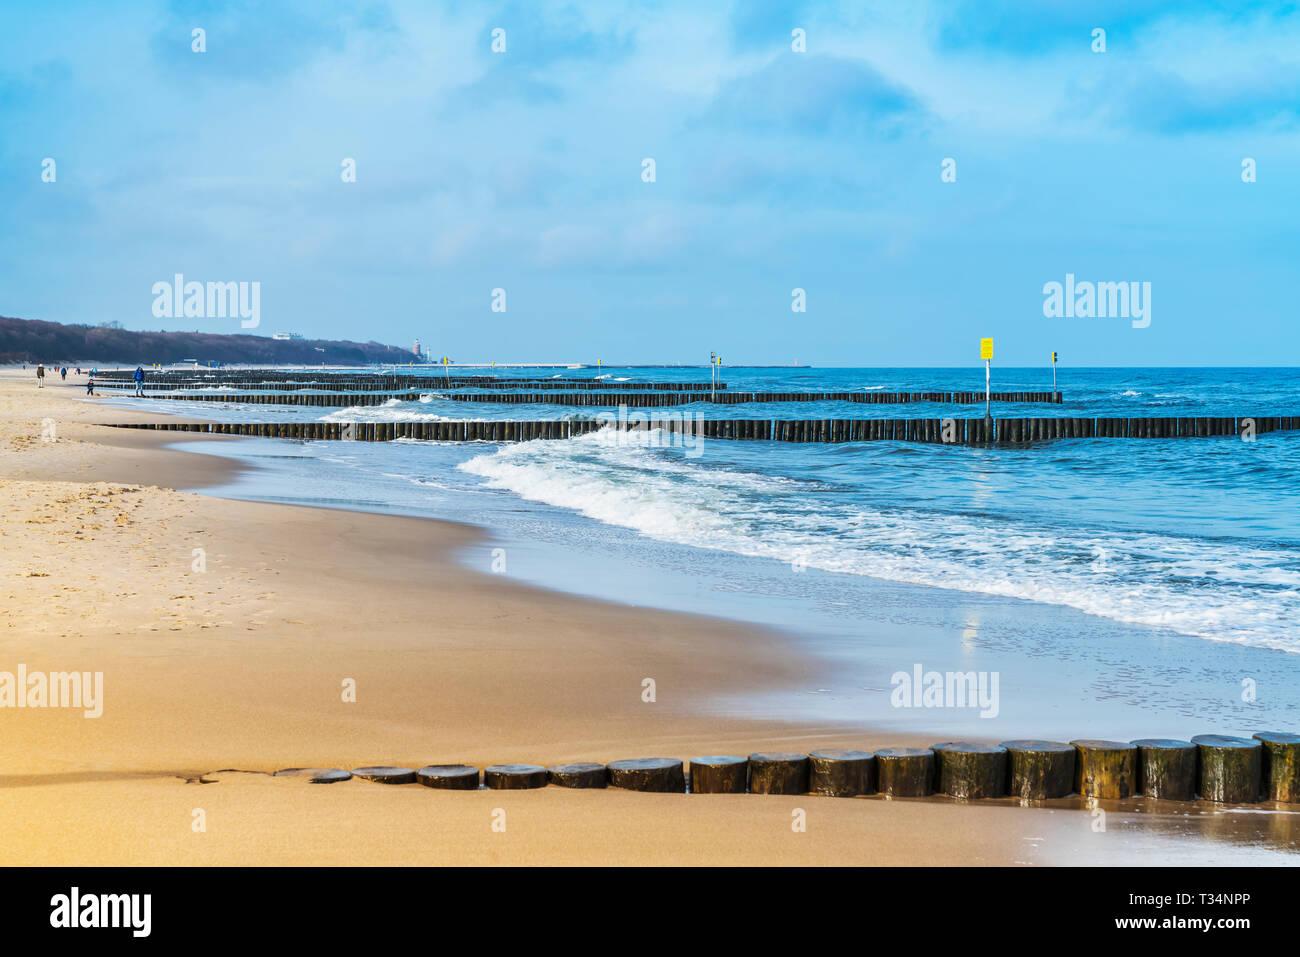 Sandy Beach with groynes on the Baltic Sea, Kolobrzeg, West Pomeranian, Poland, Europe Stock Photo